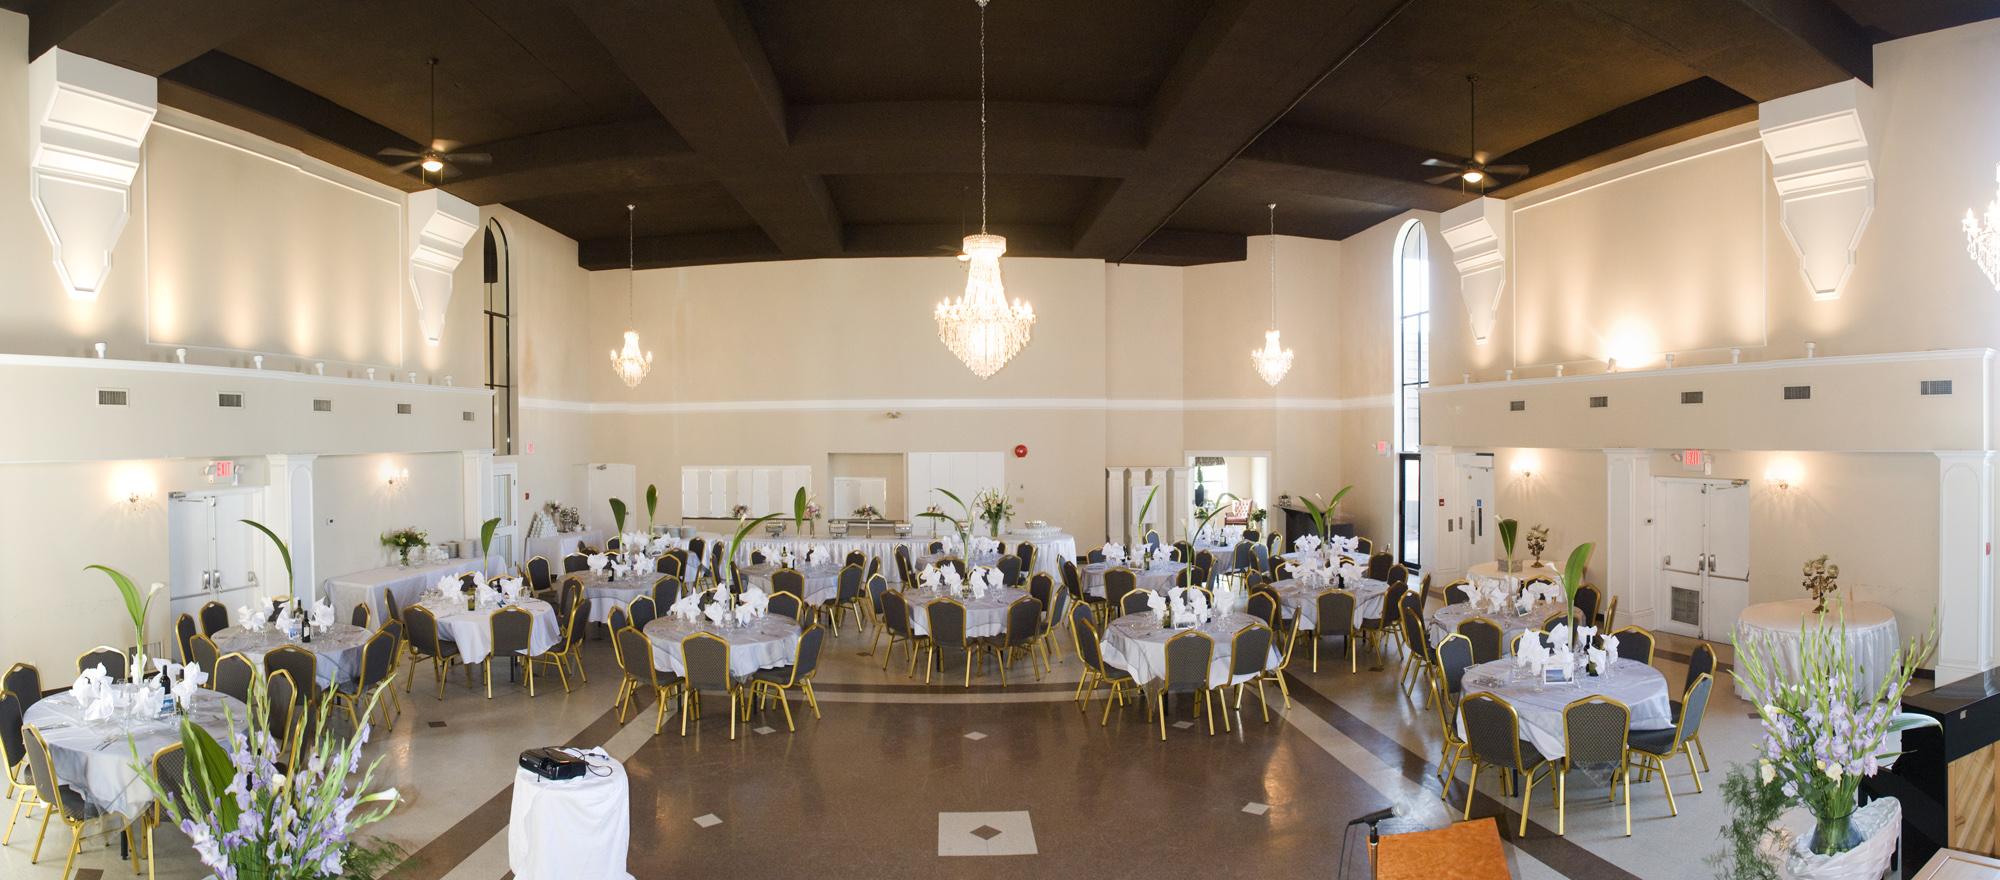 Hall Rental St Gregory Church BC Canada